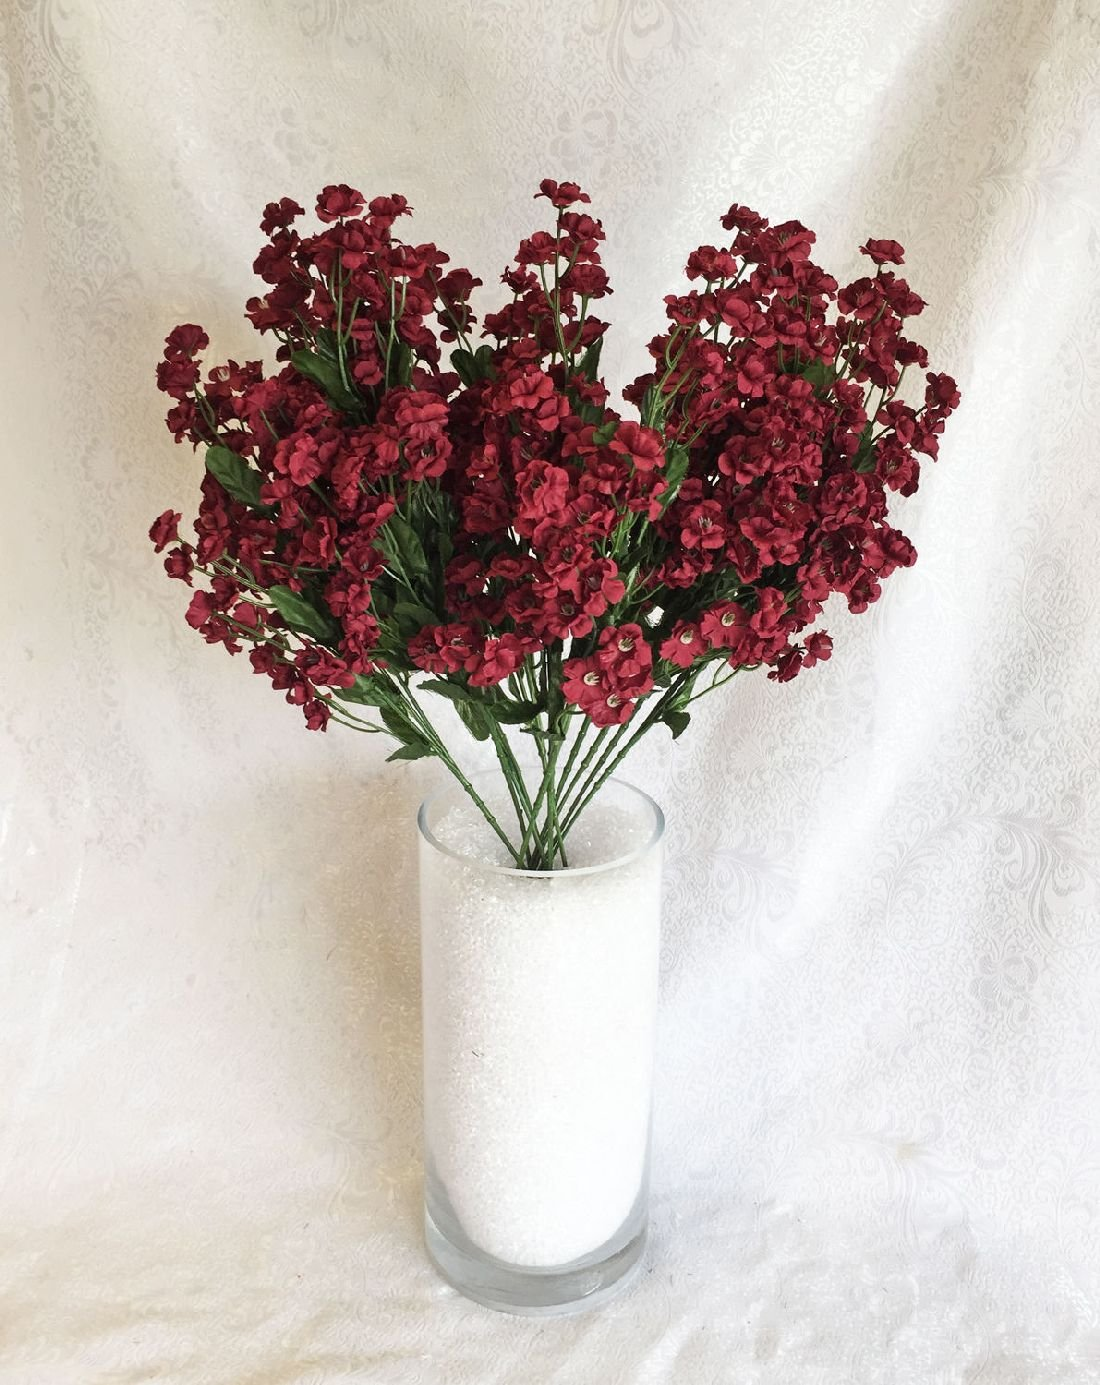 12-Babys-Breath-Burgundy-Gypsophila-Silk-Wedding-Flowers-Centerpieces-Bouquet